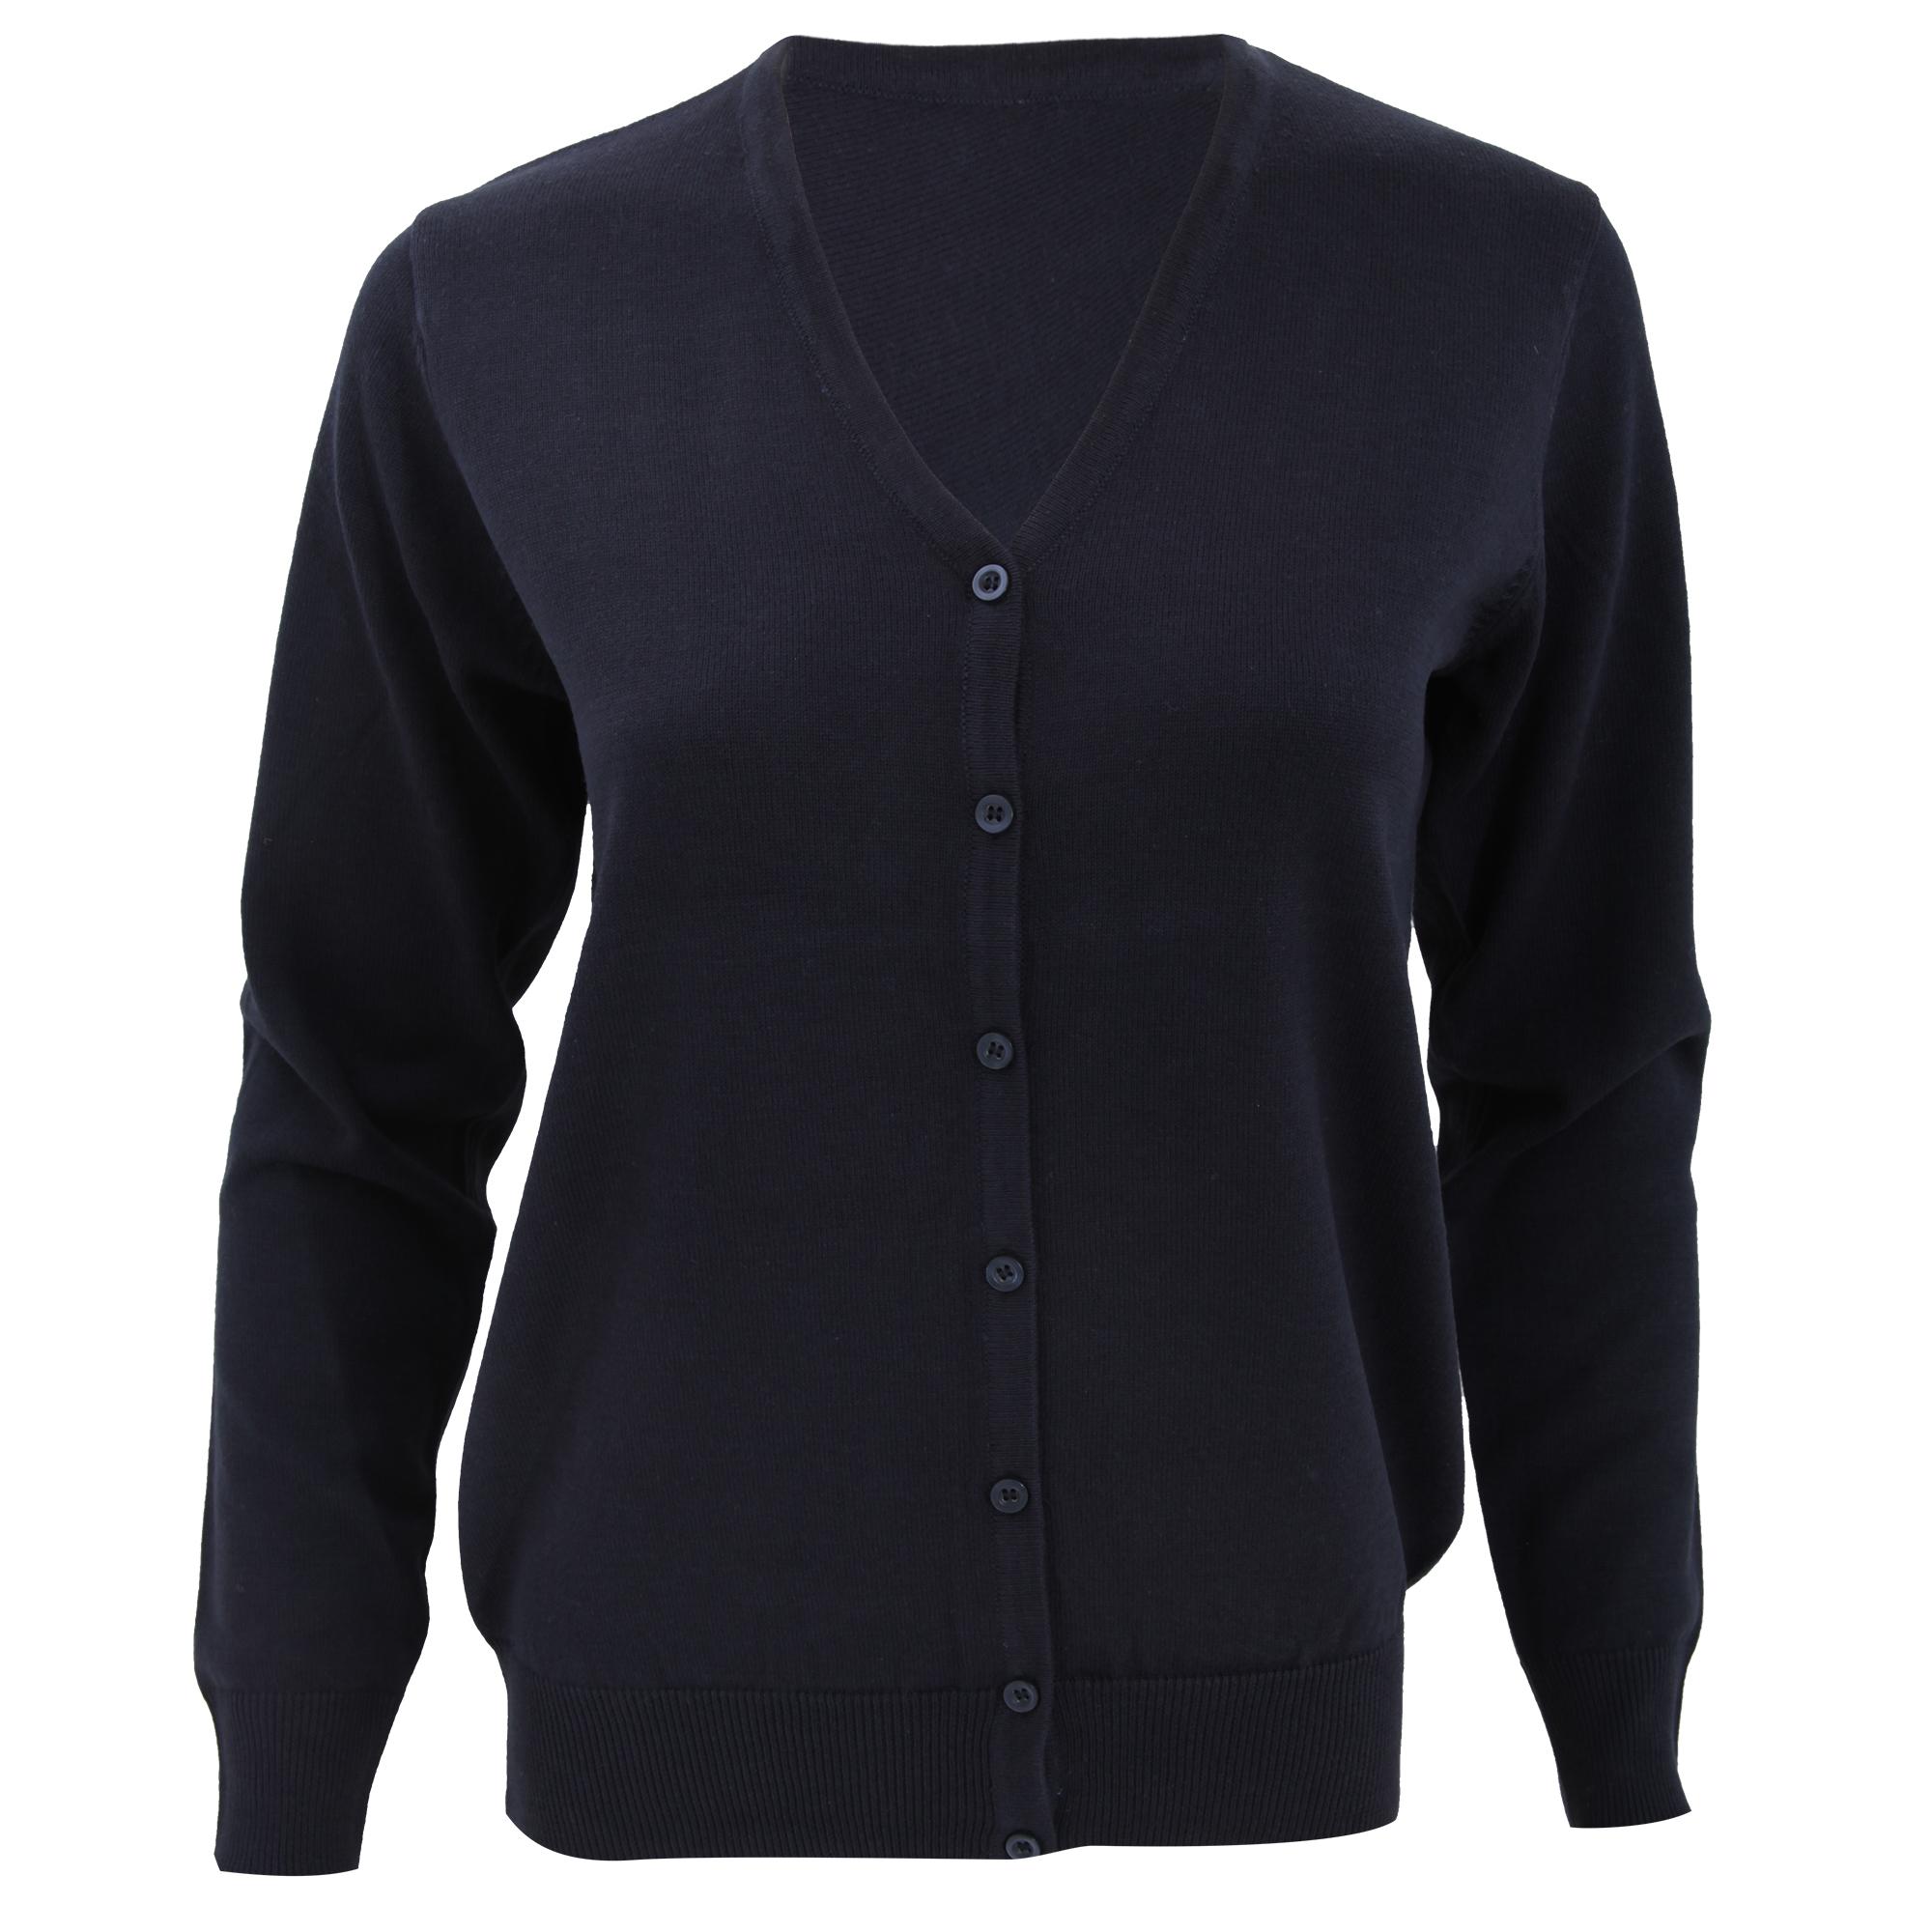 Kustom Kit Womens V-Neck Cardigan / Ladies Knitwear (6) (Navy Blue)